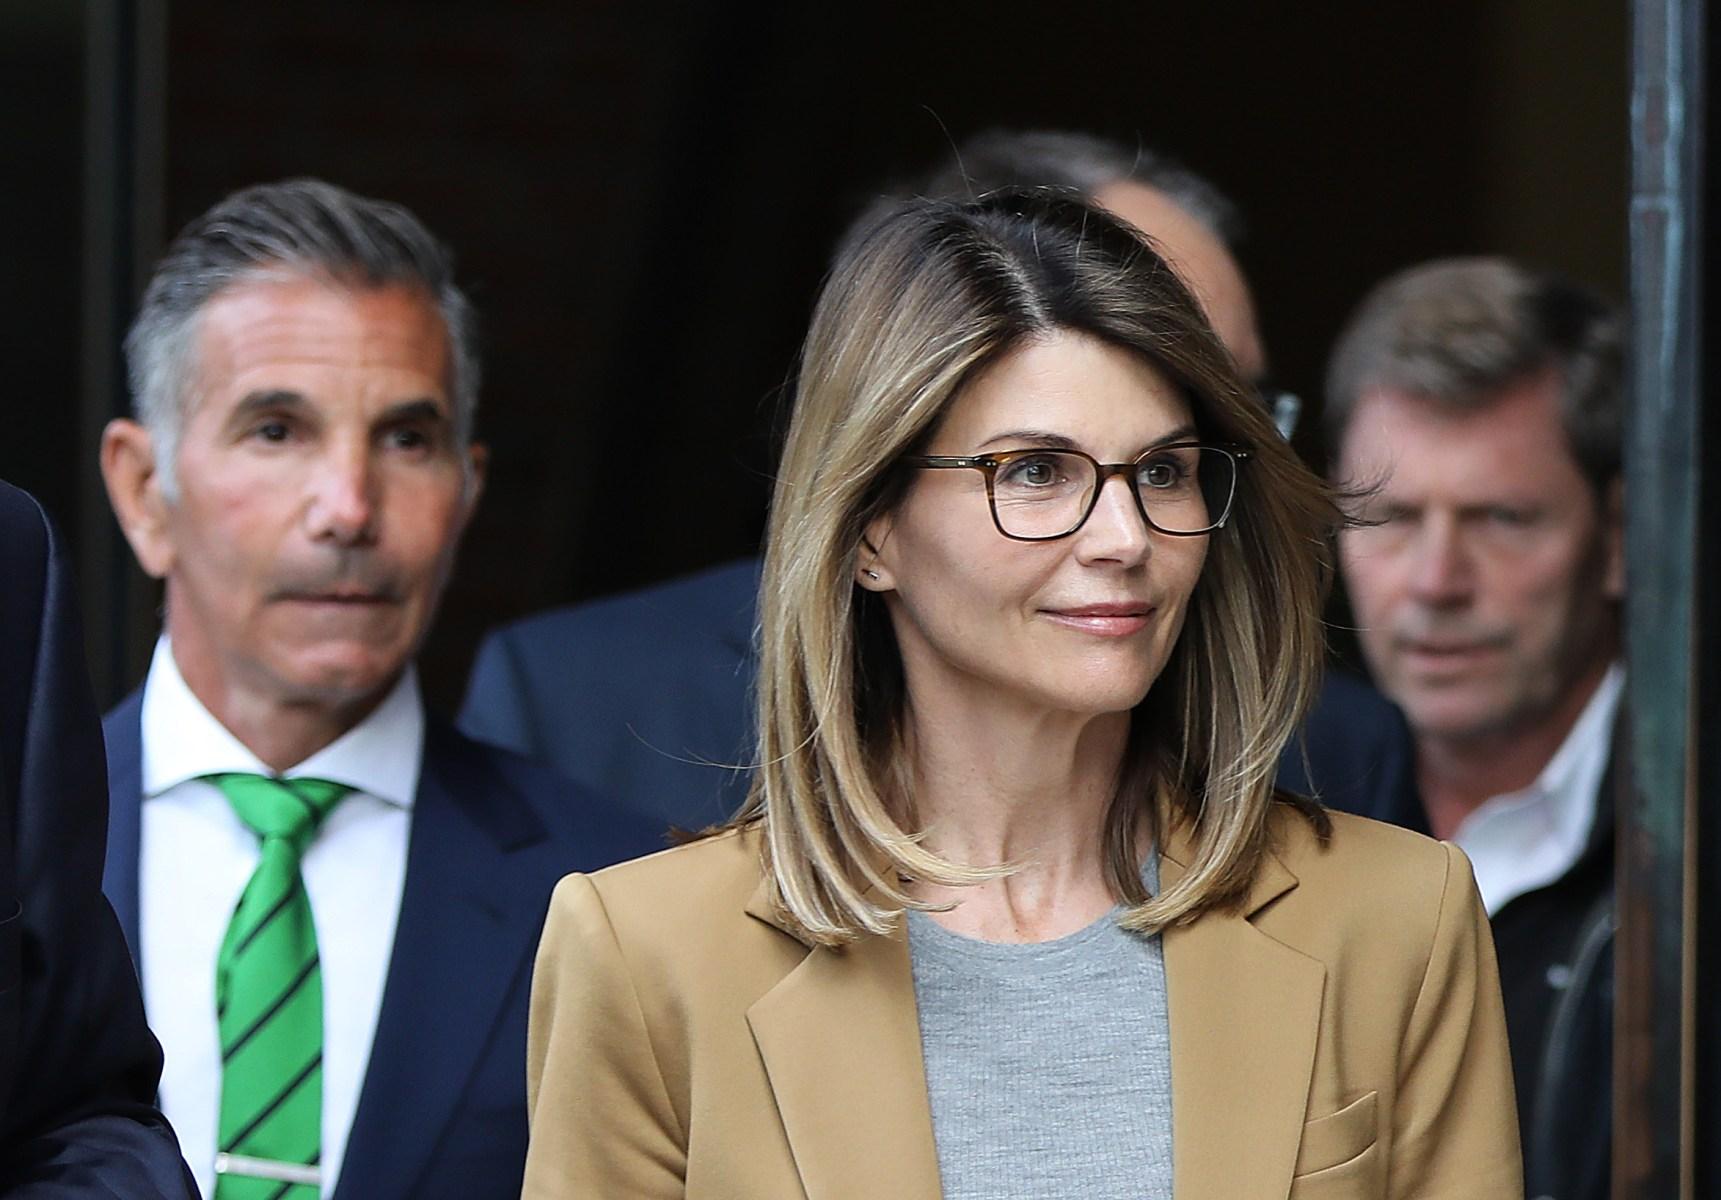 Lori Loughlin accused of money laundering